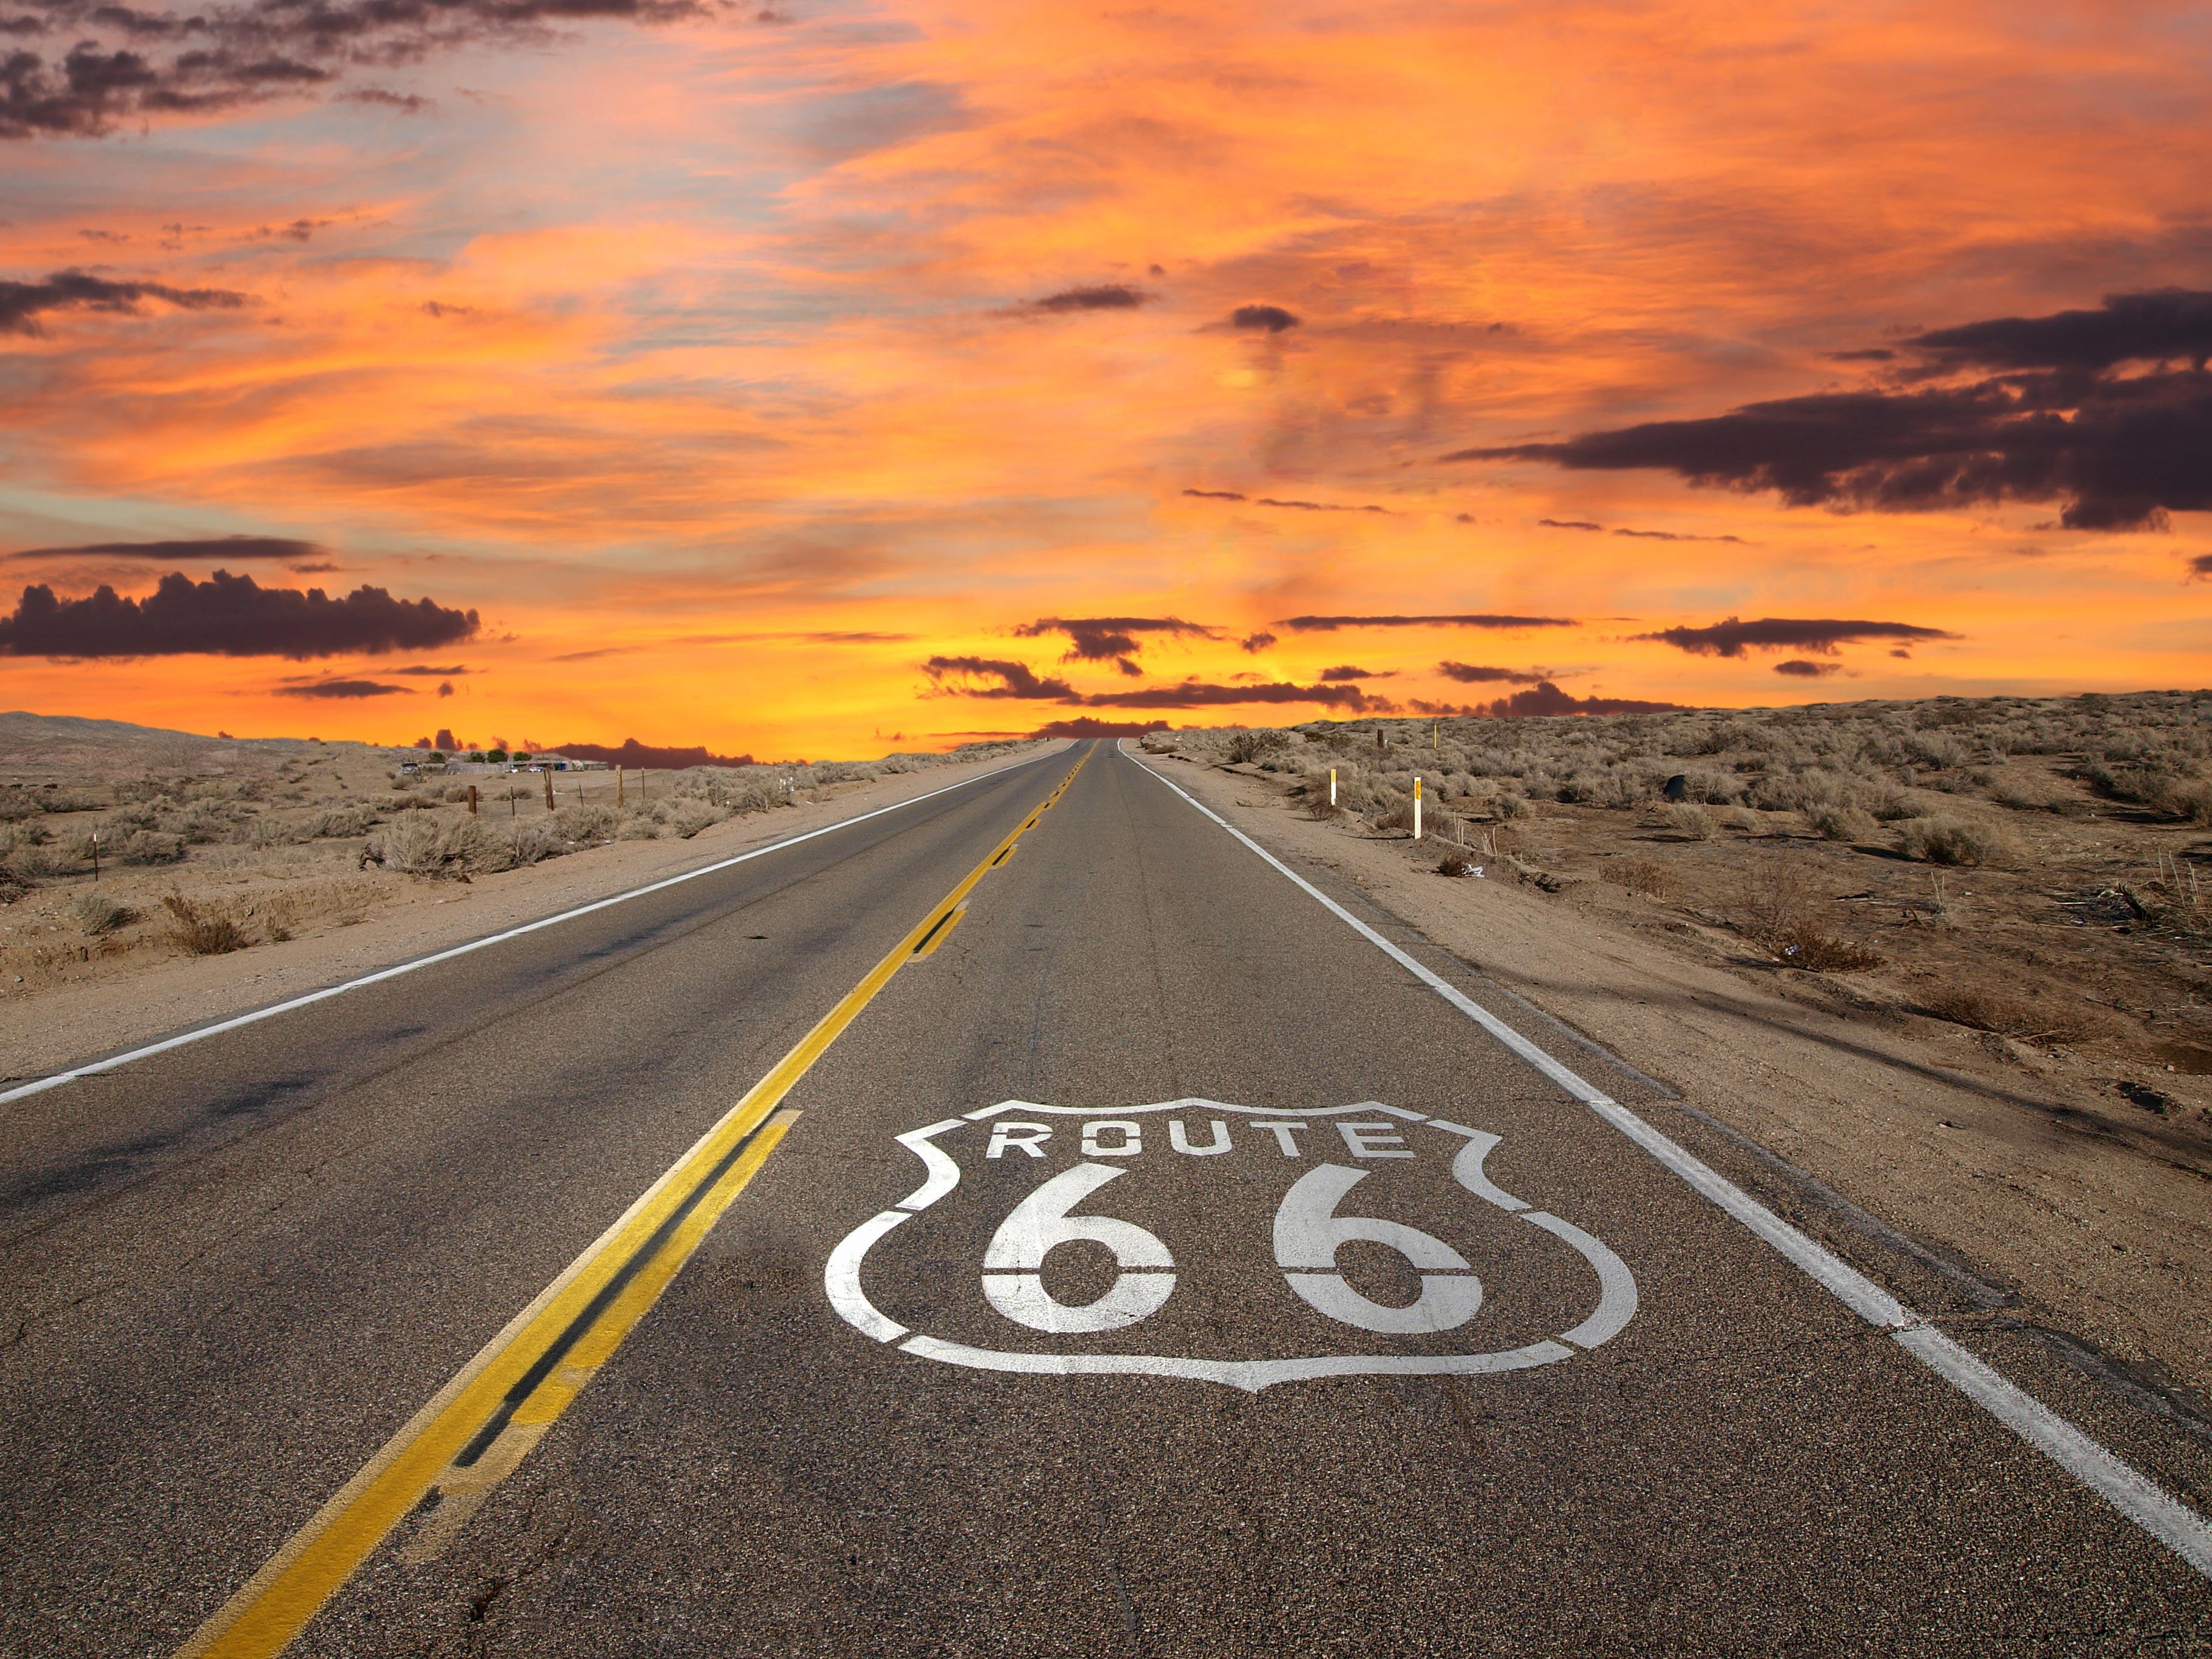 usa-decouverte-de-la-route-66